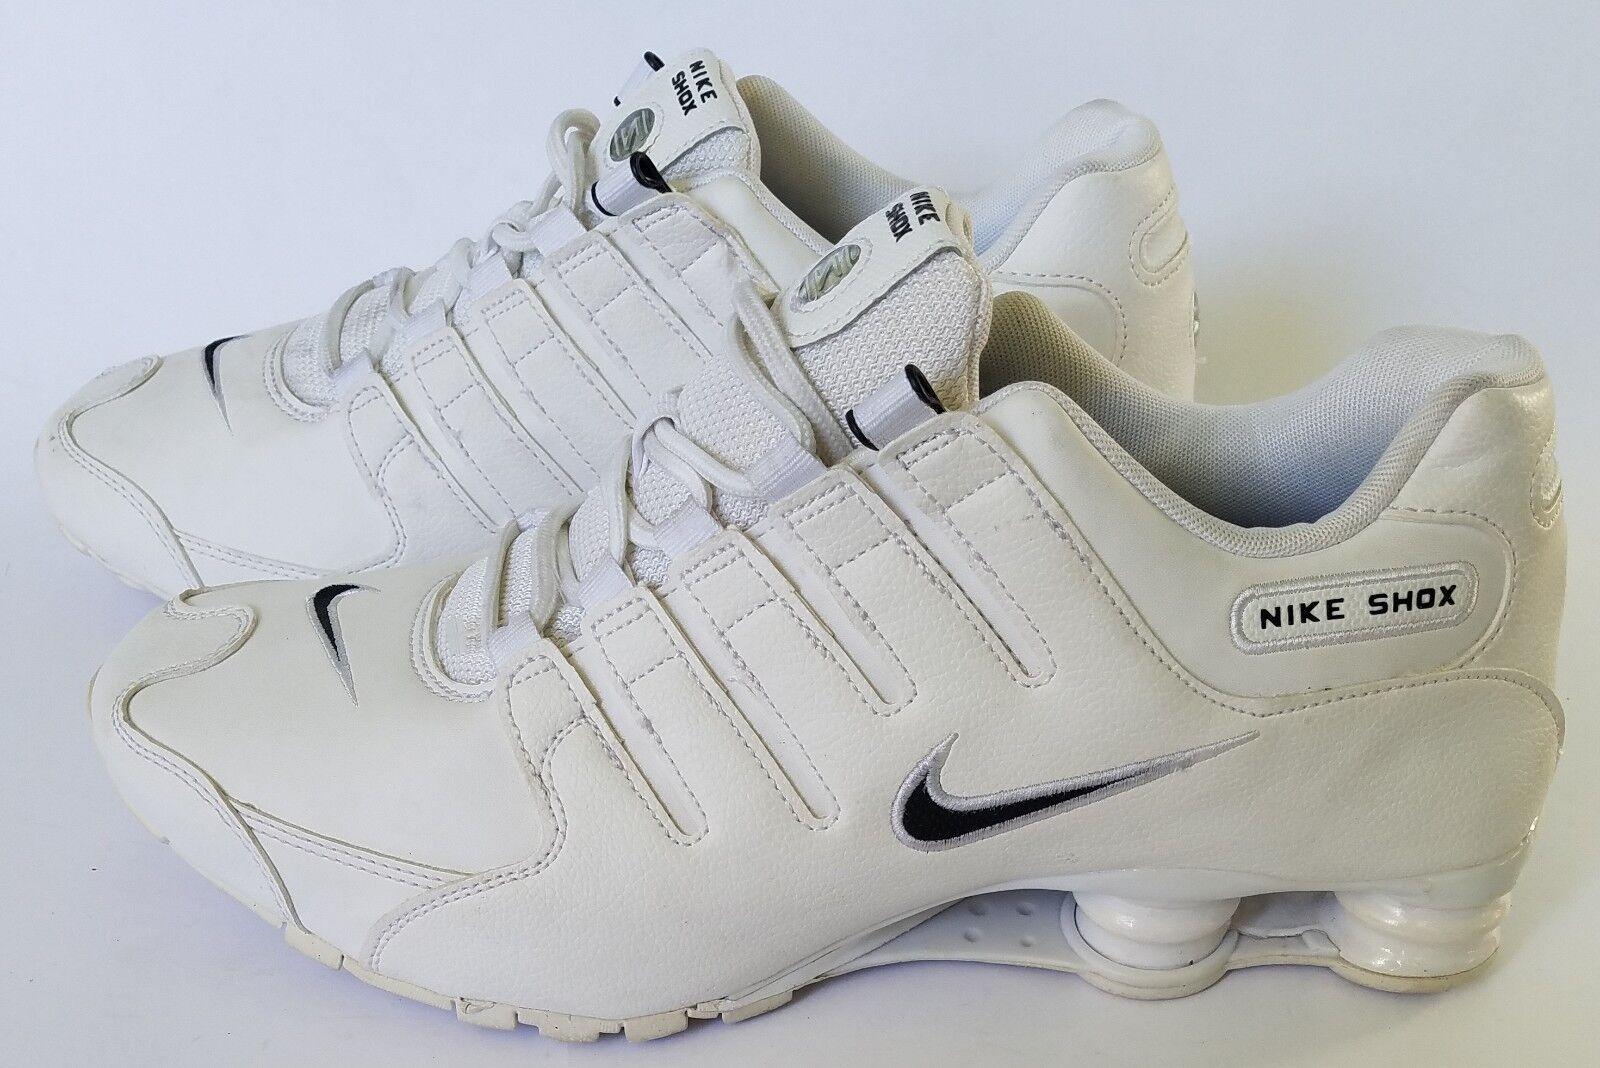 quality design 8db38 4ae83 Nike Shox NZ EU Men s Size 13, 13, 13, Running Shoes White . New Balance  ML597AAC Sneaker ...